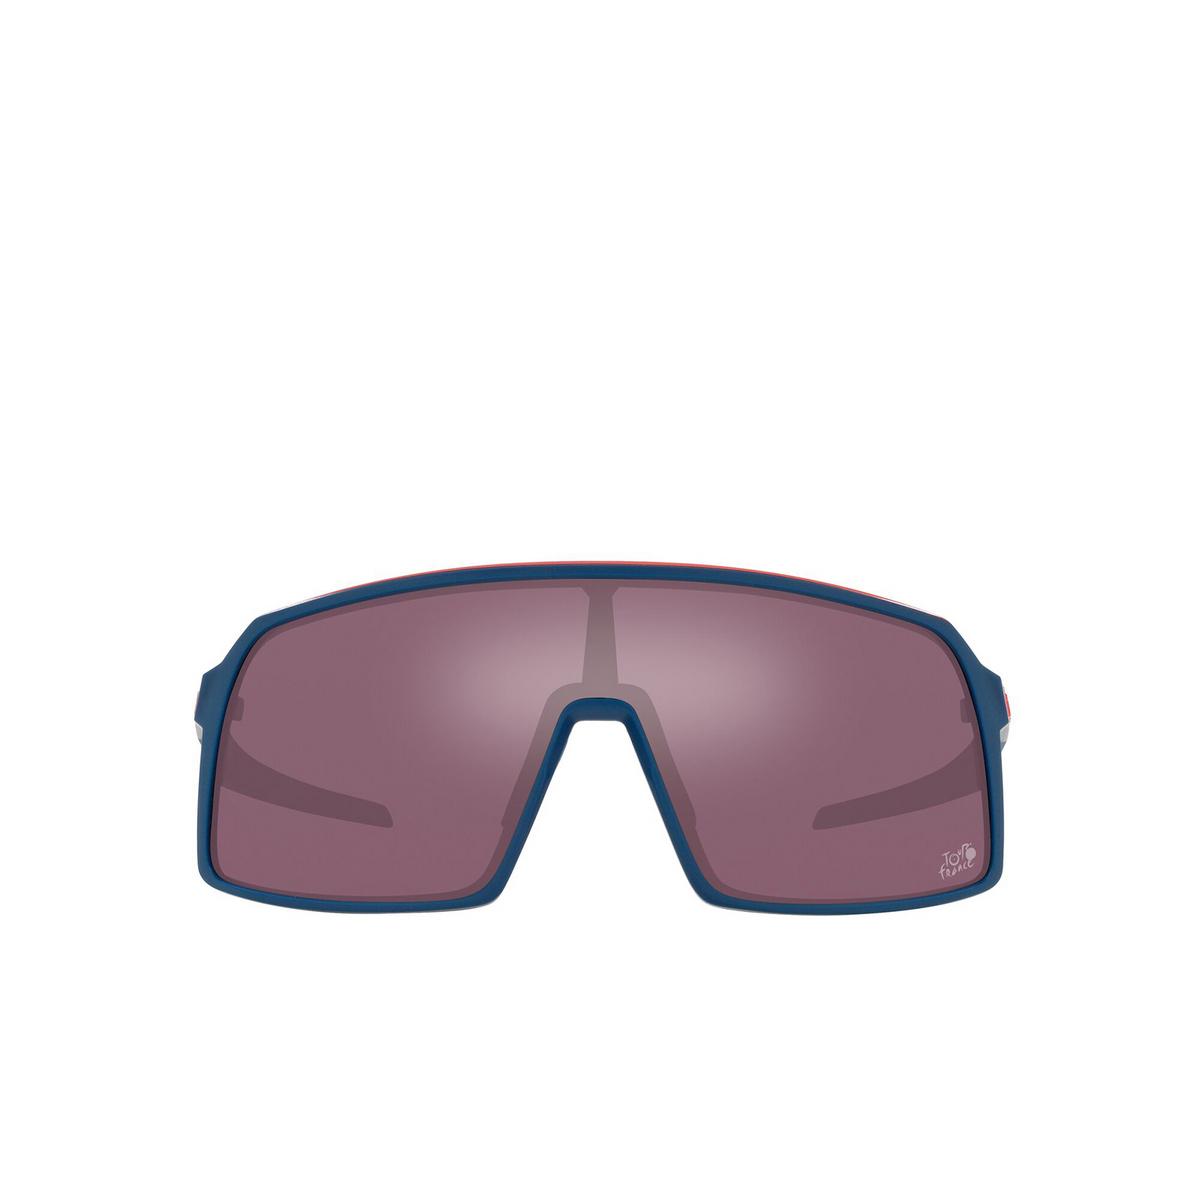 Oakley® Sport Sunglasses: Sutro OO9406 color Tdf Poseidon 940658 - front view.